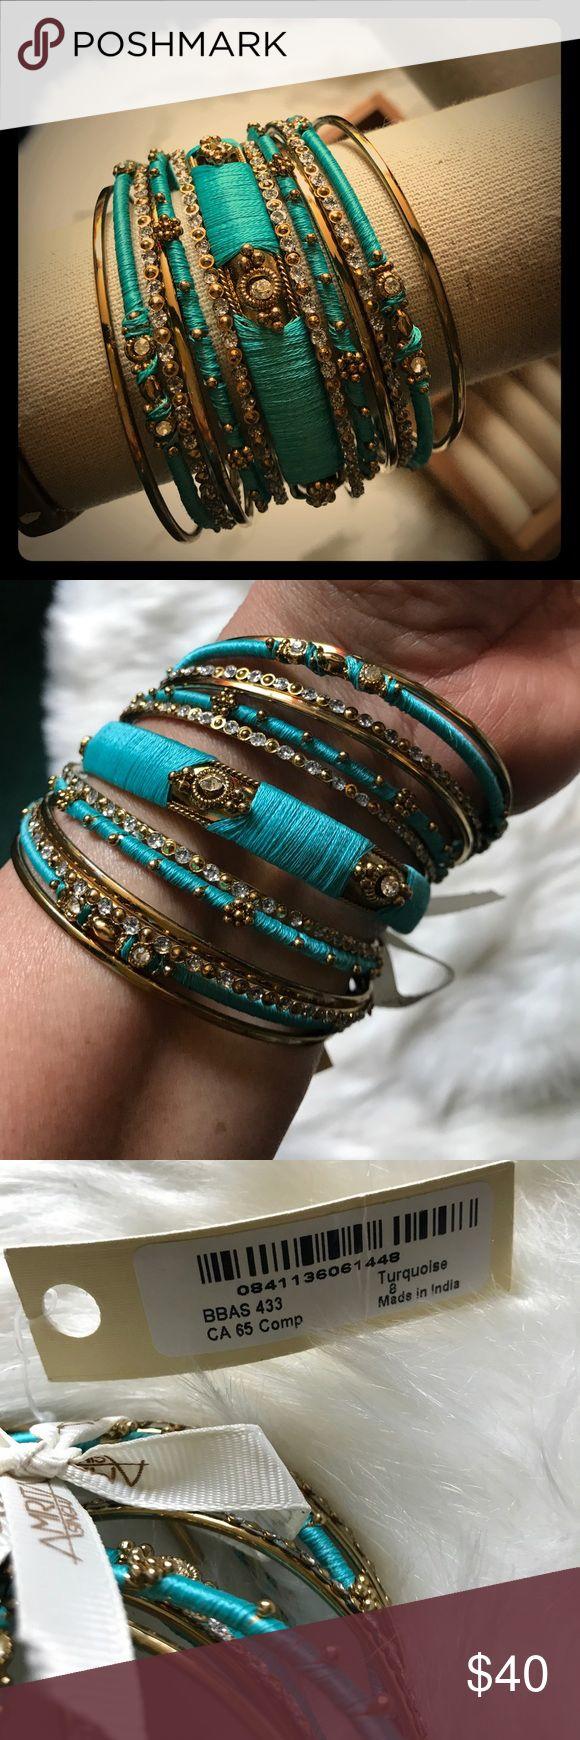 "Amrita Singh 13-piece Ankara Bangle Bracelet Set Amrita Singh 13-piece Ankara Bangle Bracelet Set in gold tone with turquoise silk thread and Austrian crystal details. Size 8"" (20.32 cm). Stacked width is 2"". NWT. Amrita Singh Jewelry Bracelets"